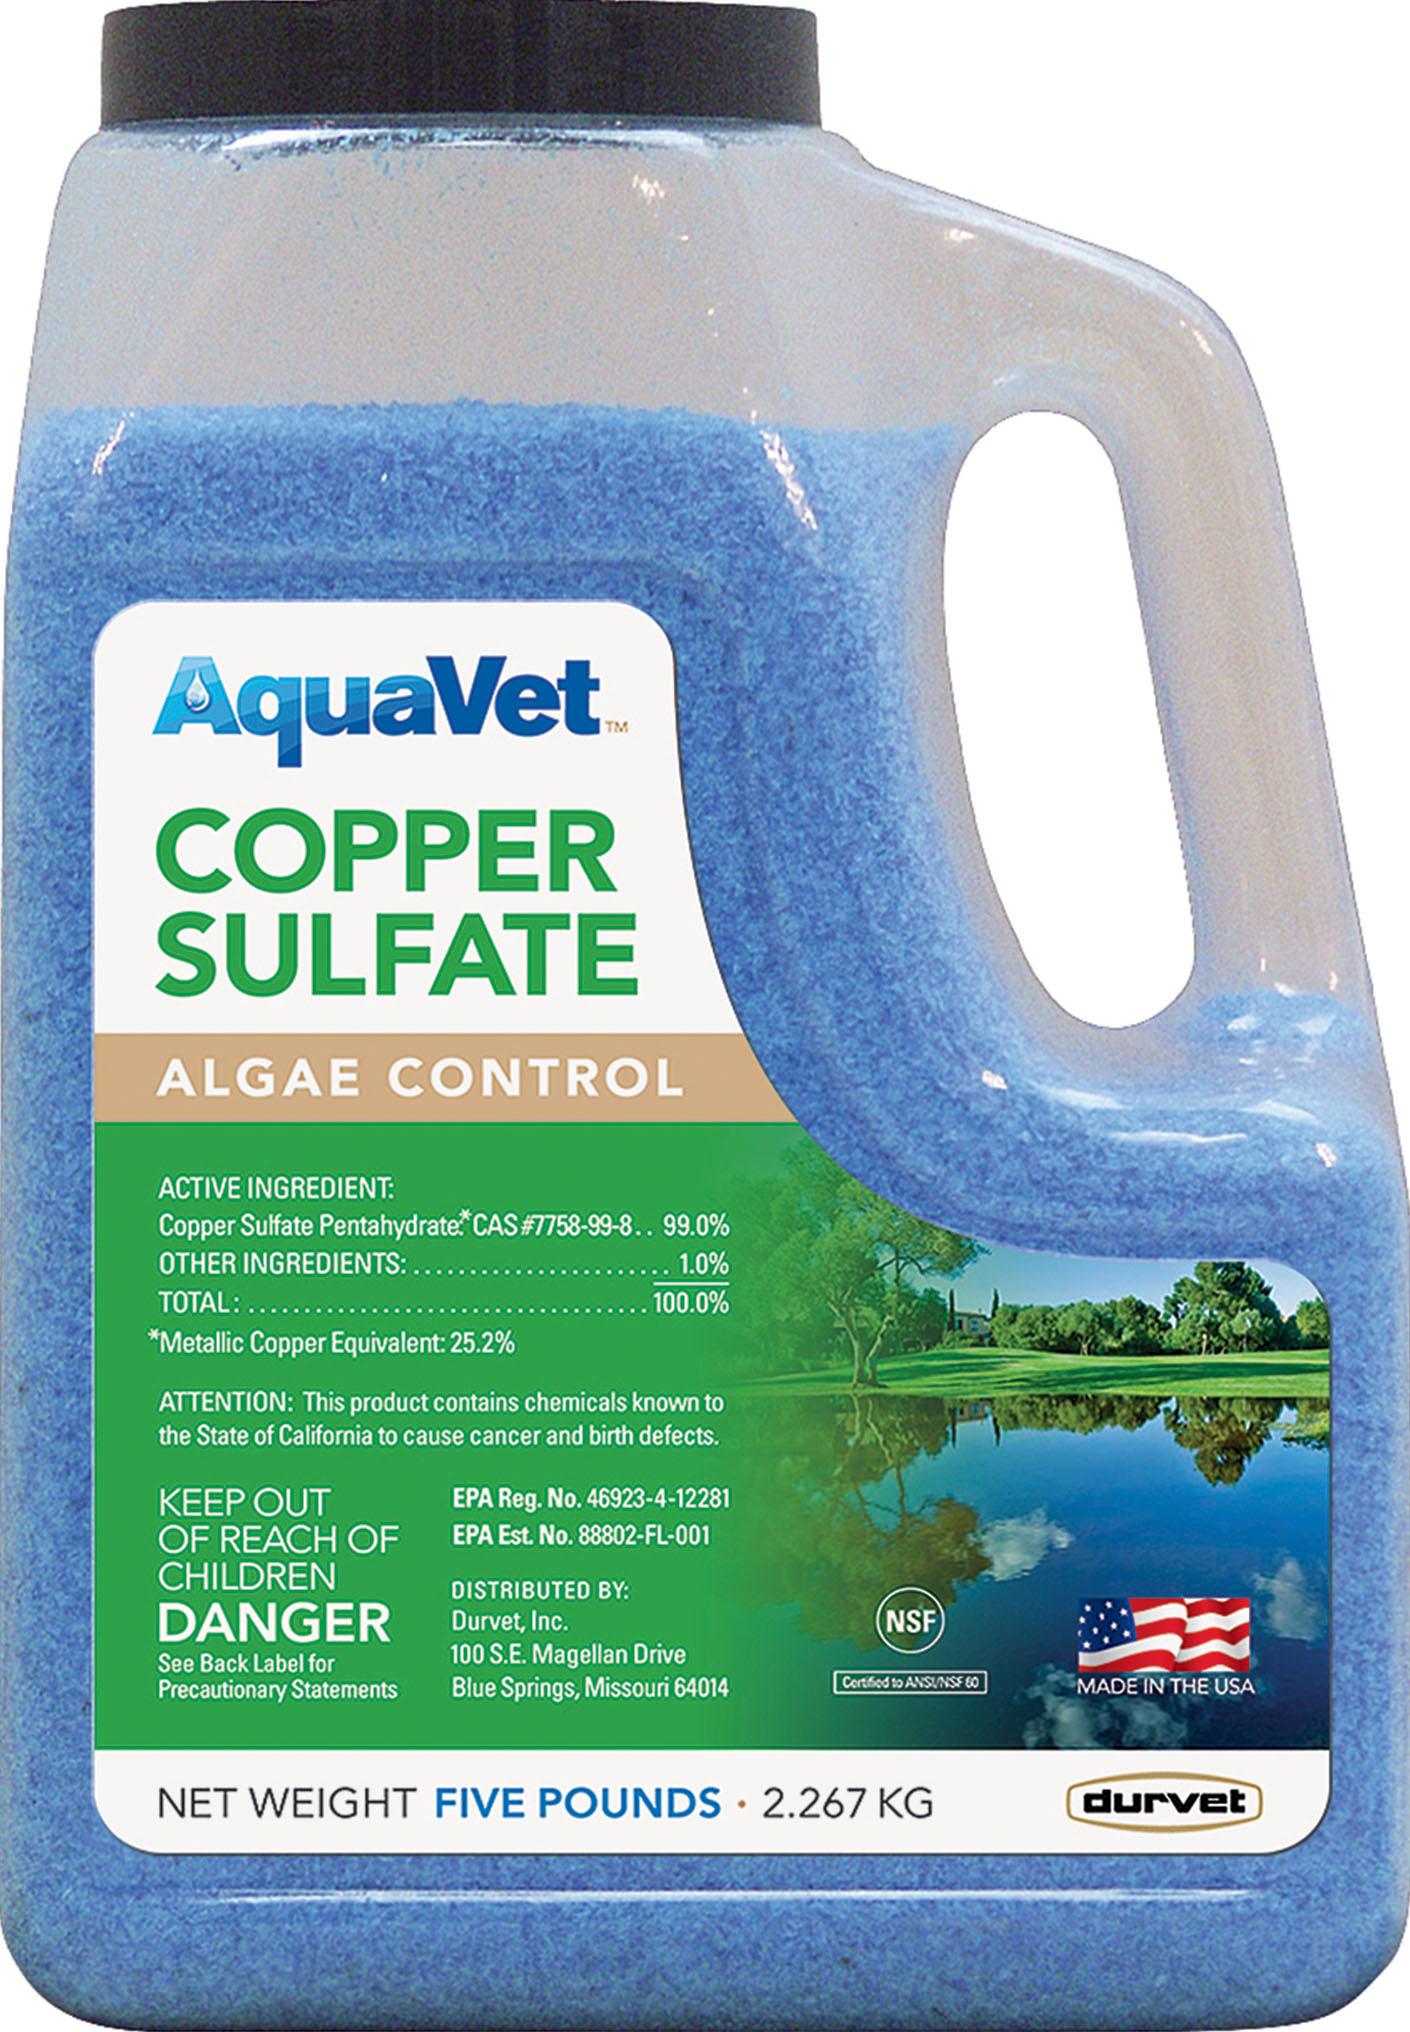 AQUAVET COPPER SULFATE ALGAE CONTROL - Walmart.com